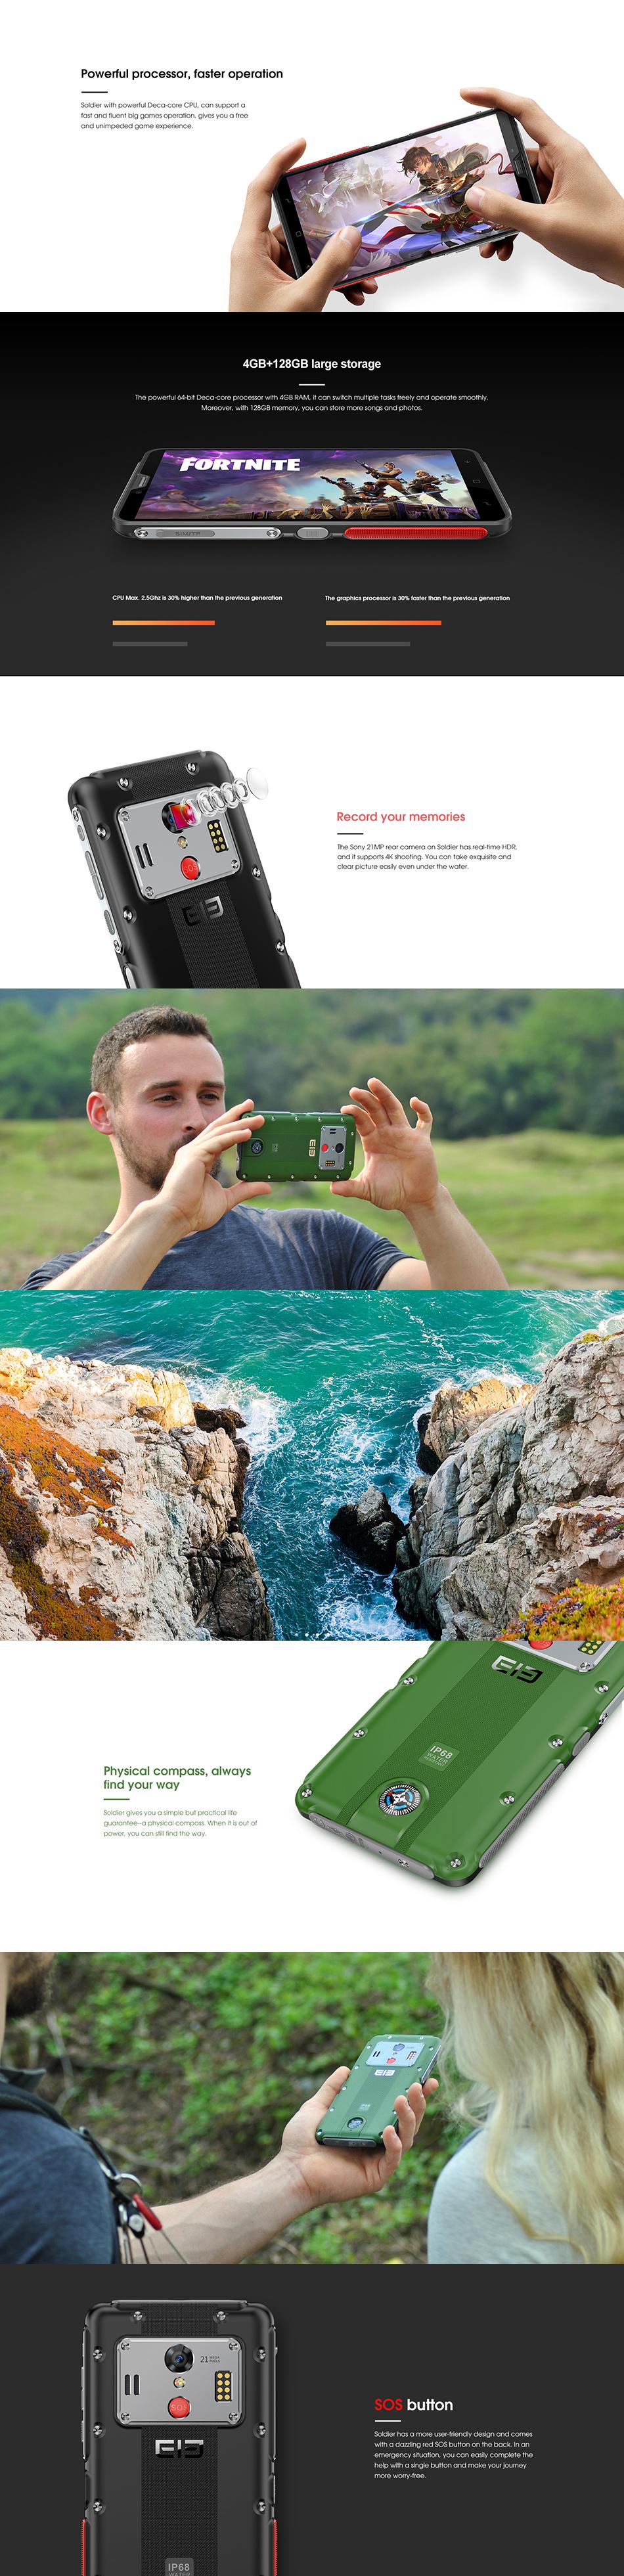 Elephone Soldier 5.5 Inch 2K Screen 5000mAh IP68 Waterproof 4GB 128GB MTK X25 Deca core 4G Smartphone